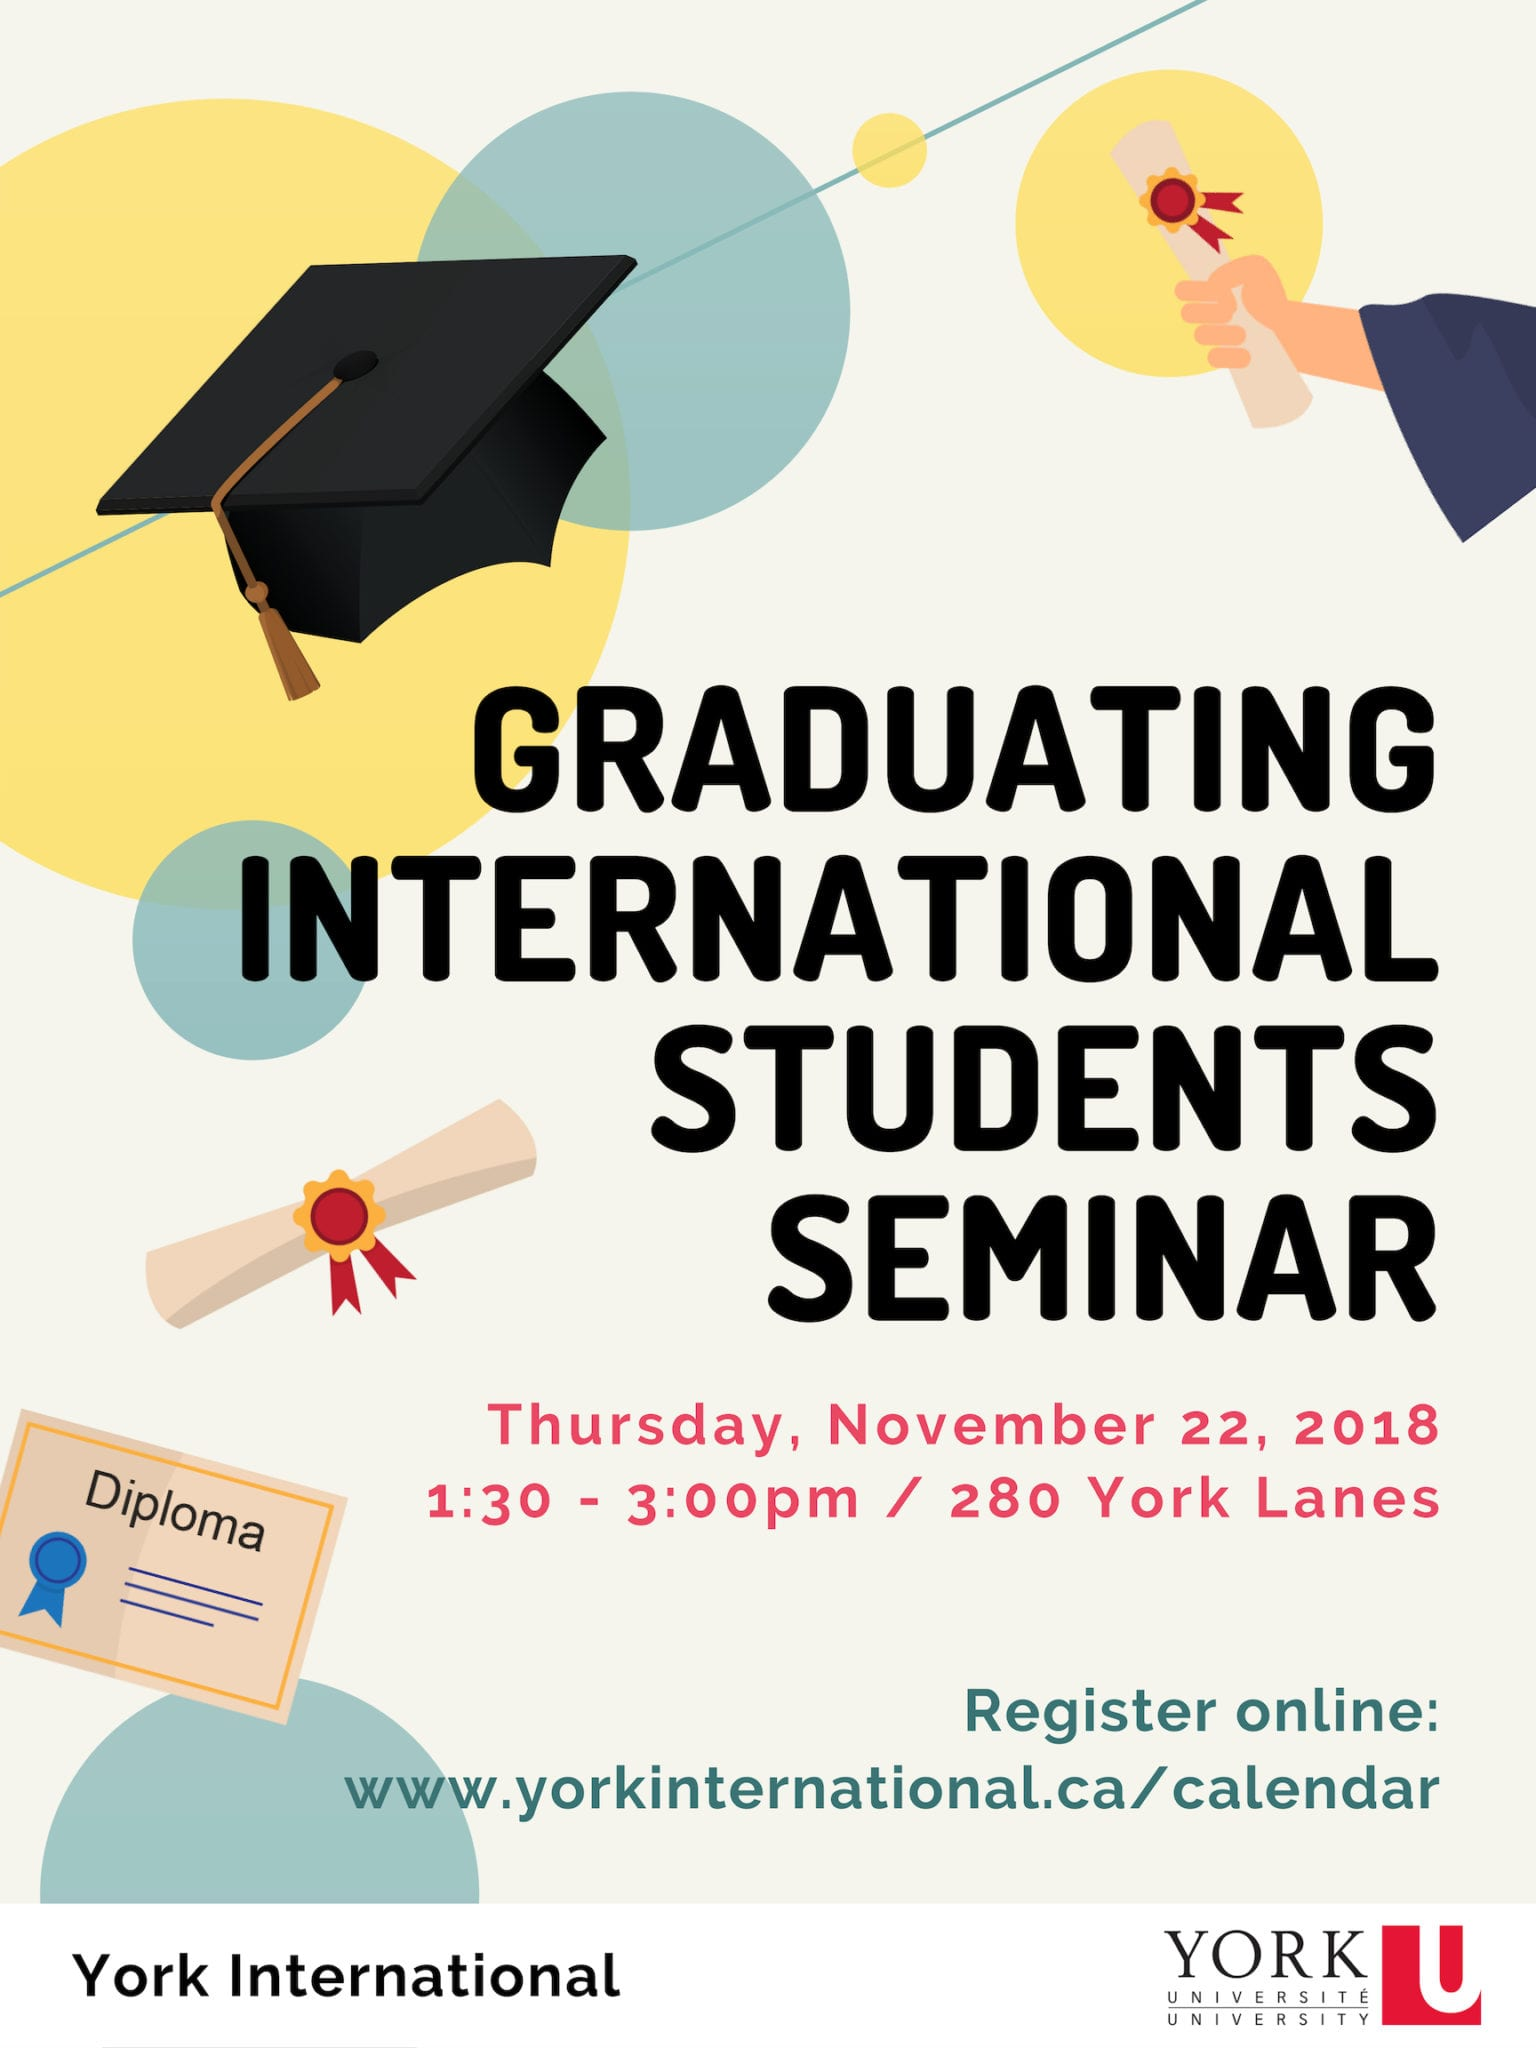 Graduating International Students Seminar @ 280N York Lanes